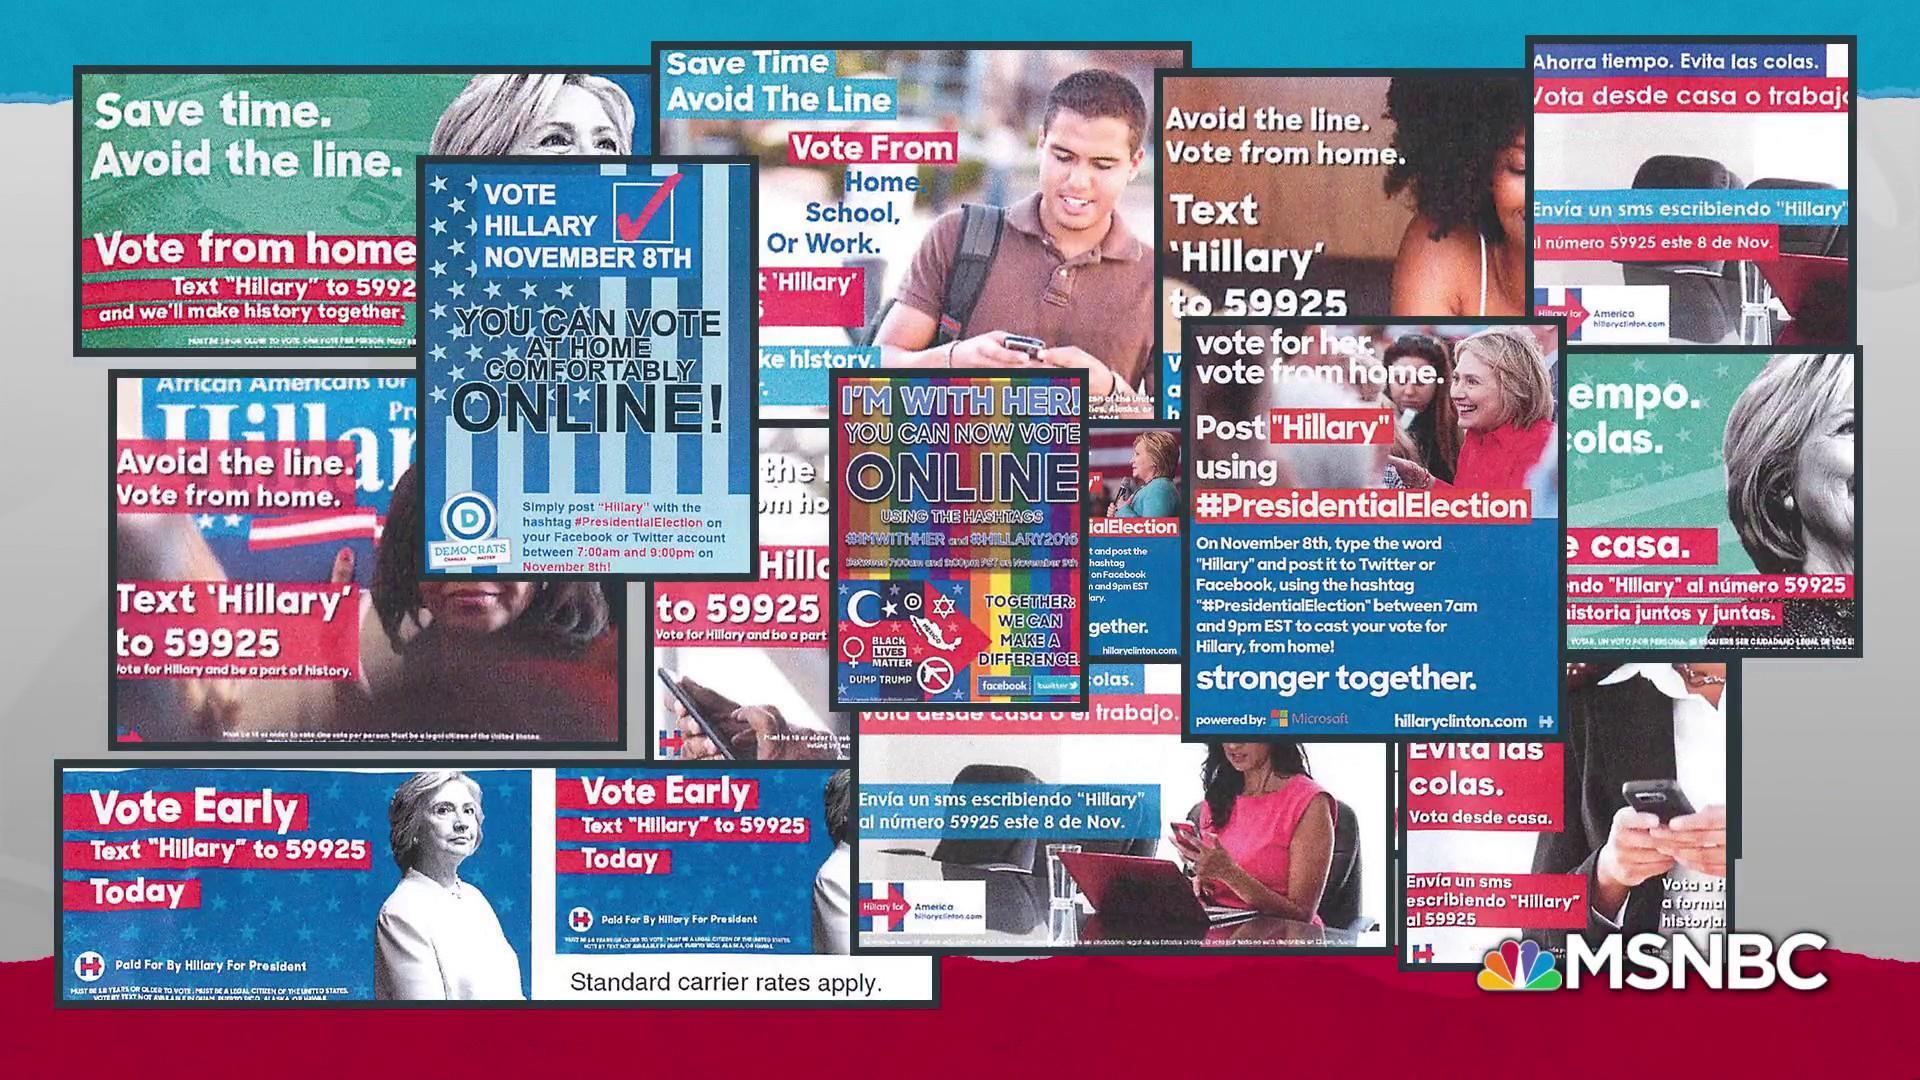 Anti-Clinton ads show major effort to subvert U.S. democracy